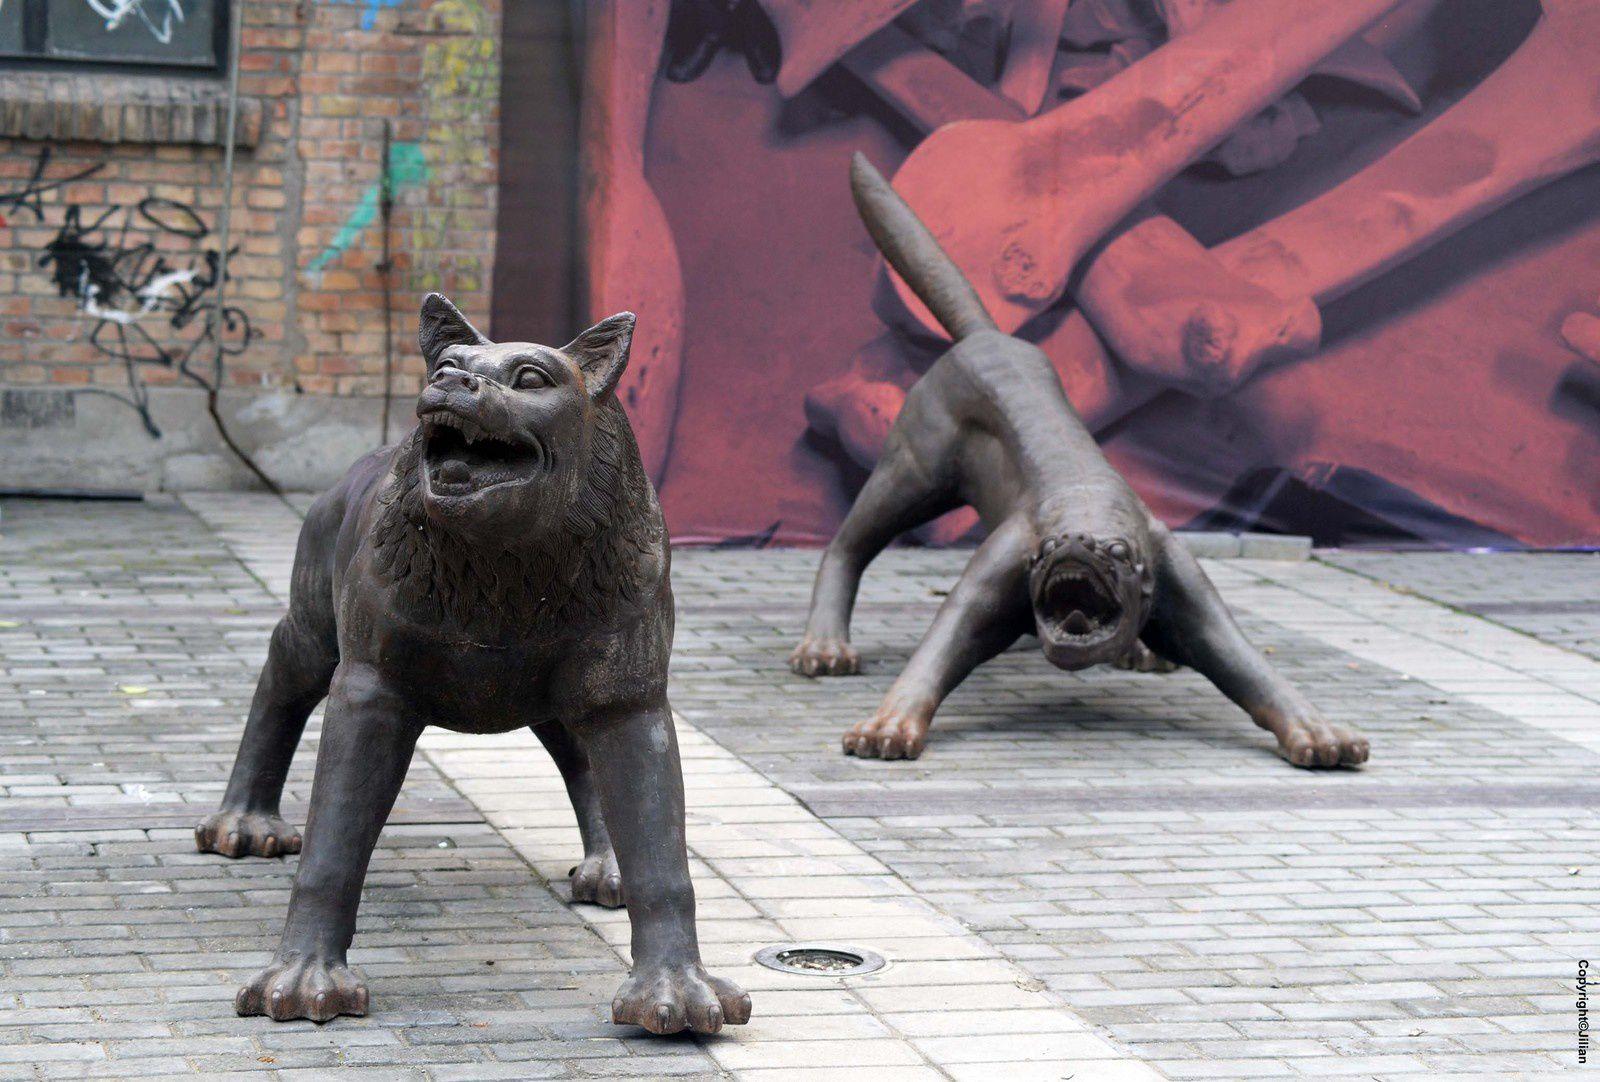 798 Art District, les allées folles - 798 艺术中心, 咆哮的世界